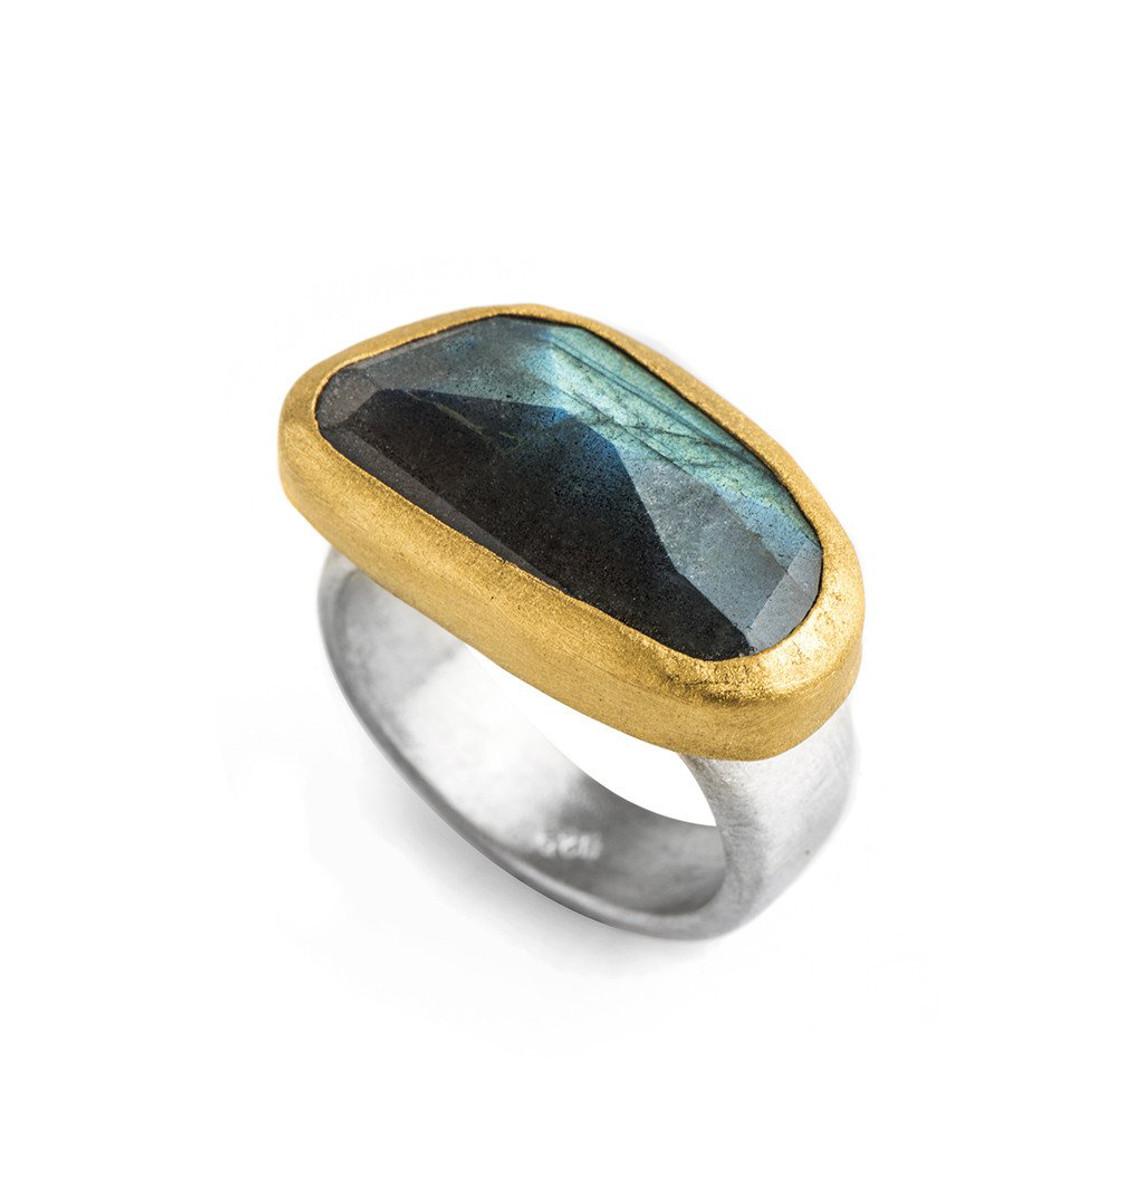 Timeless Labradorite Ring by Nava Zahavi - New Arrival